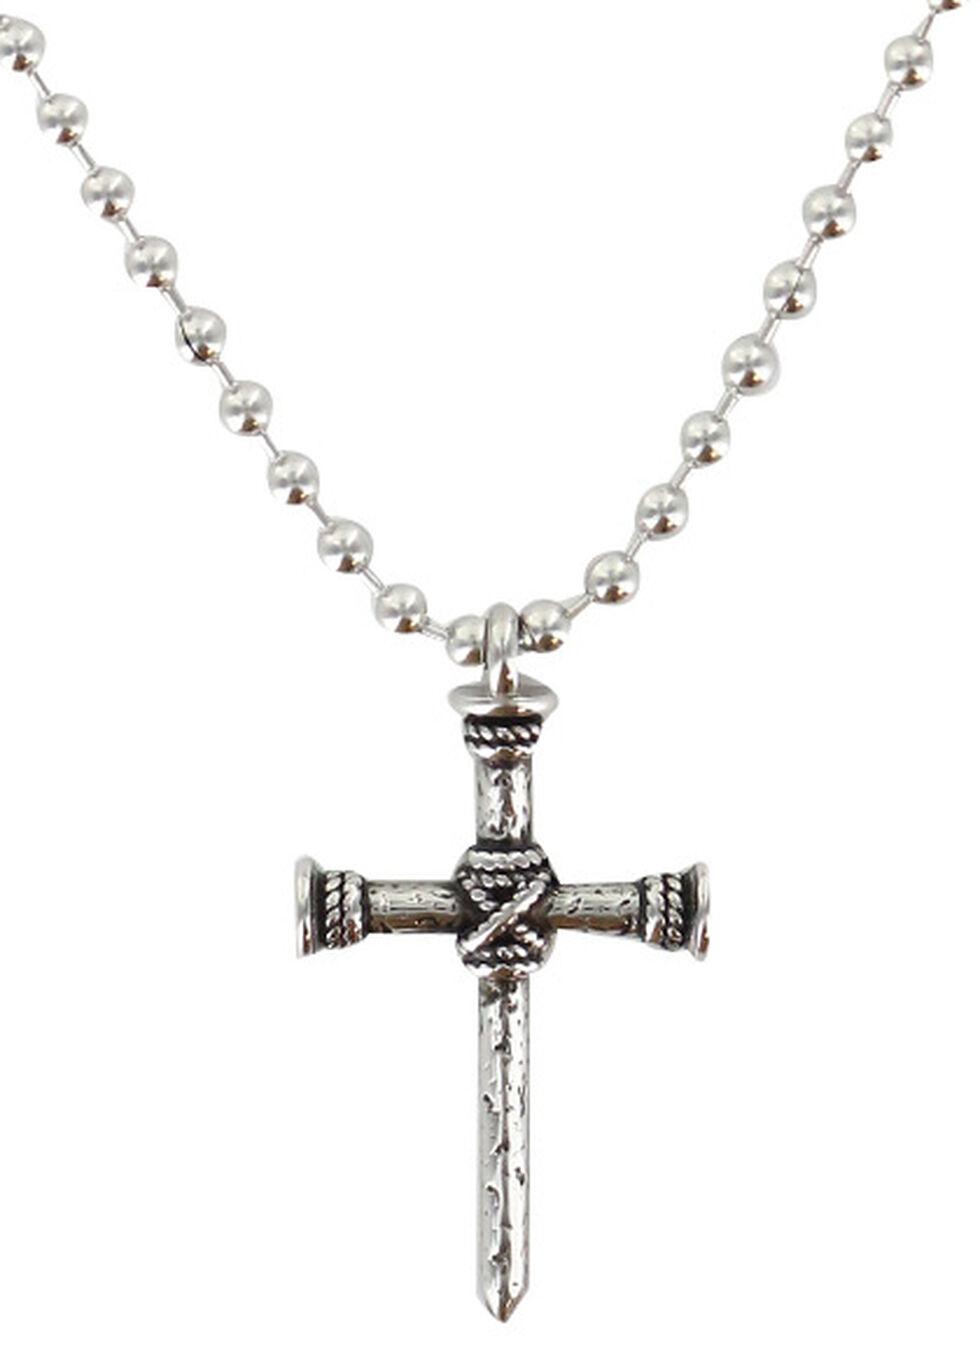 Moonshine Spirit Men's Nail Cross Necklace, Silver, hi-res